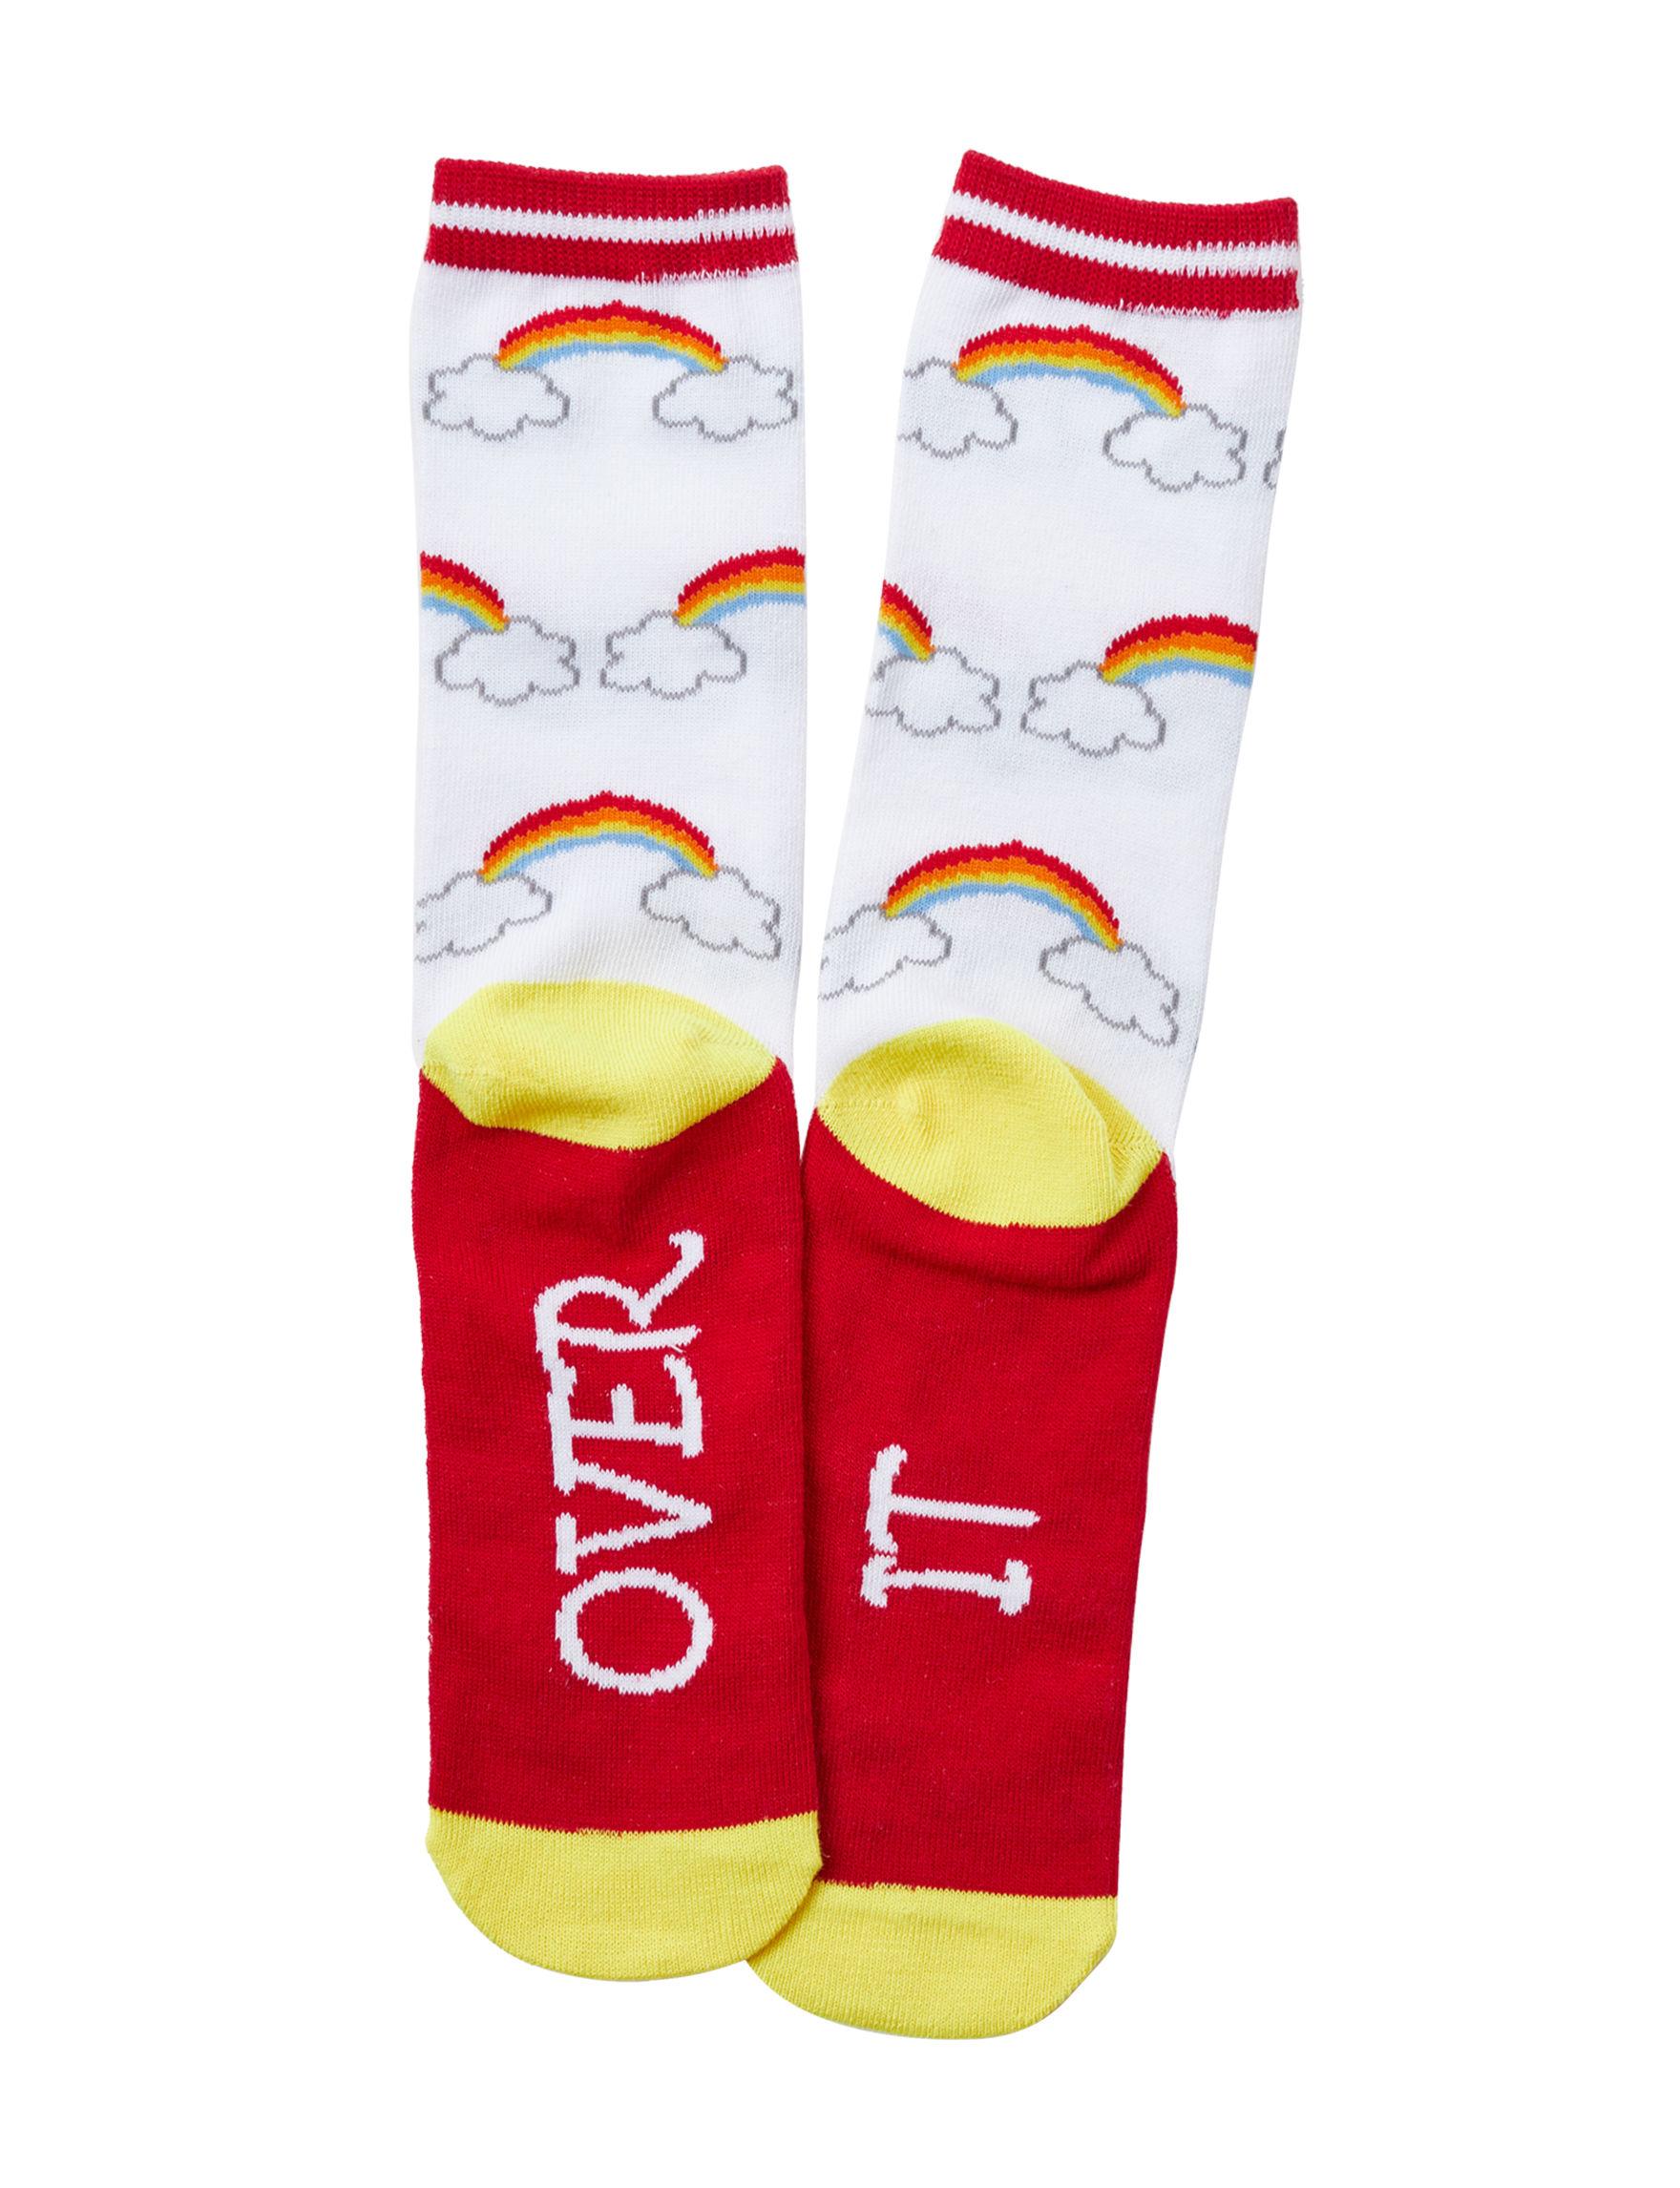 Keep Your Socks On Red Socks